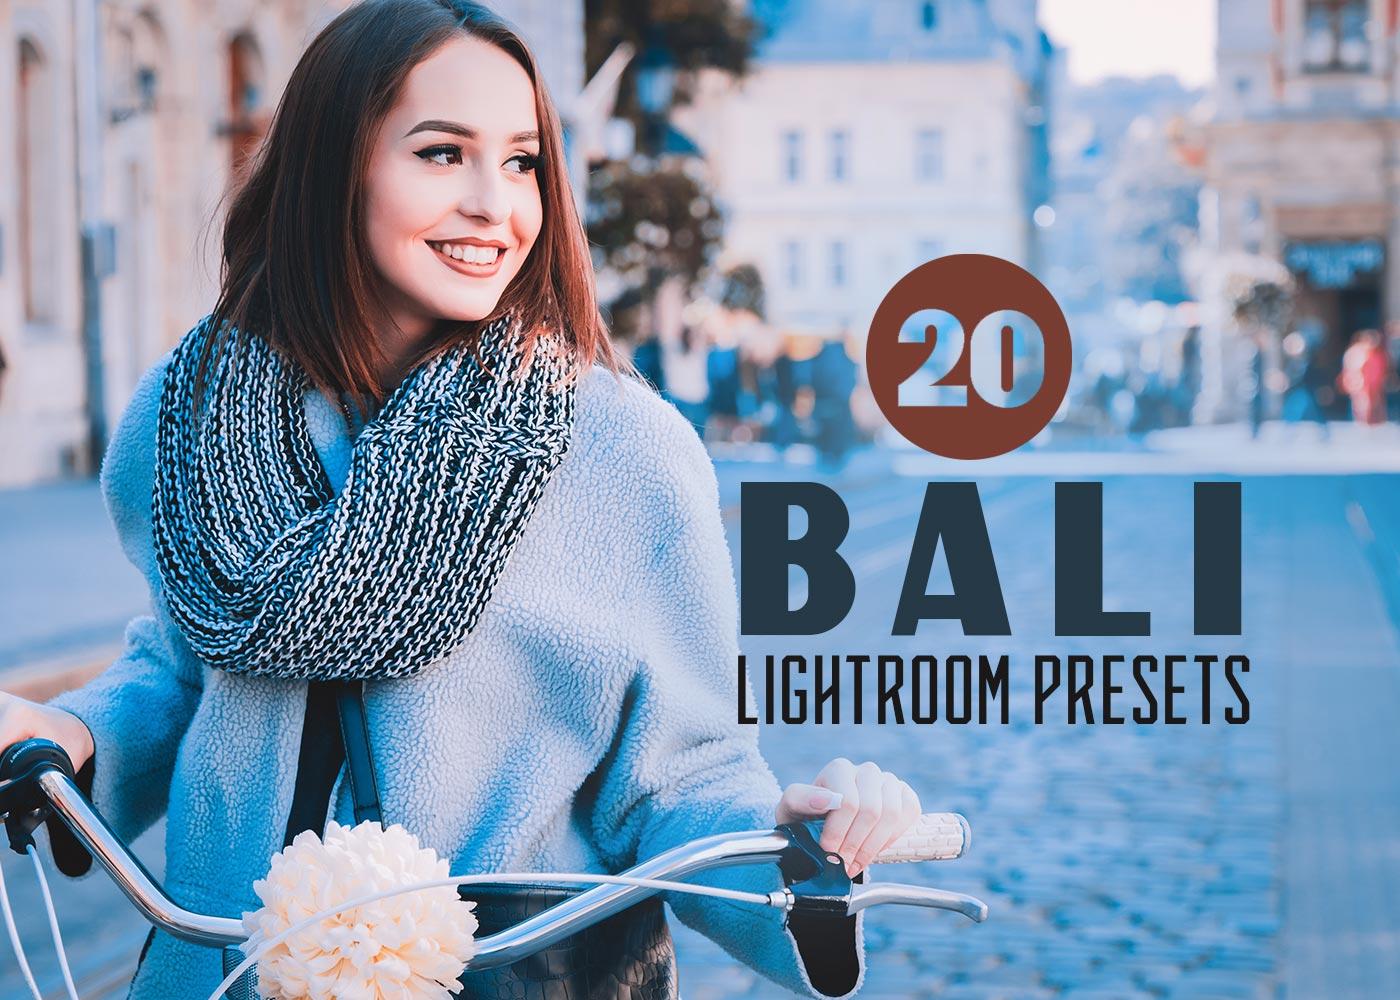 lightroom mobile presets feature bali